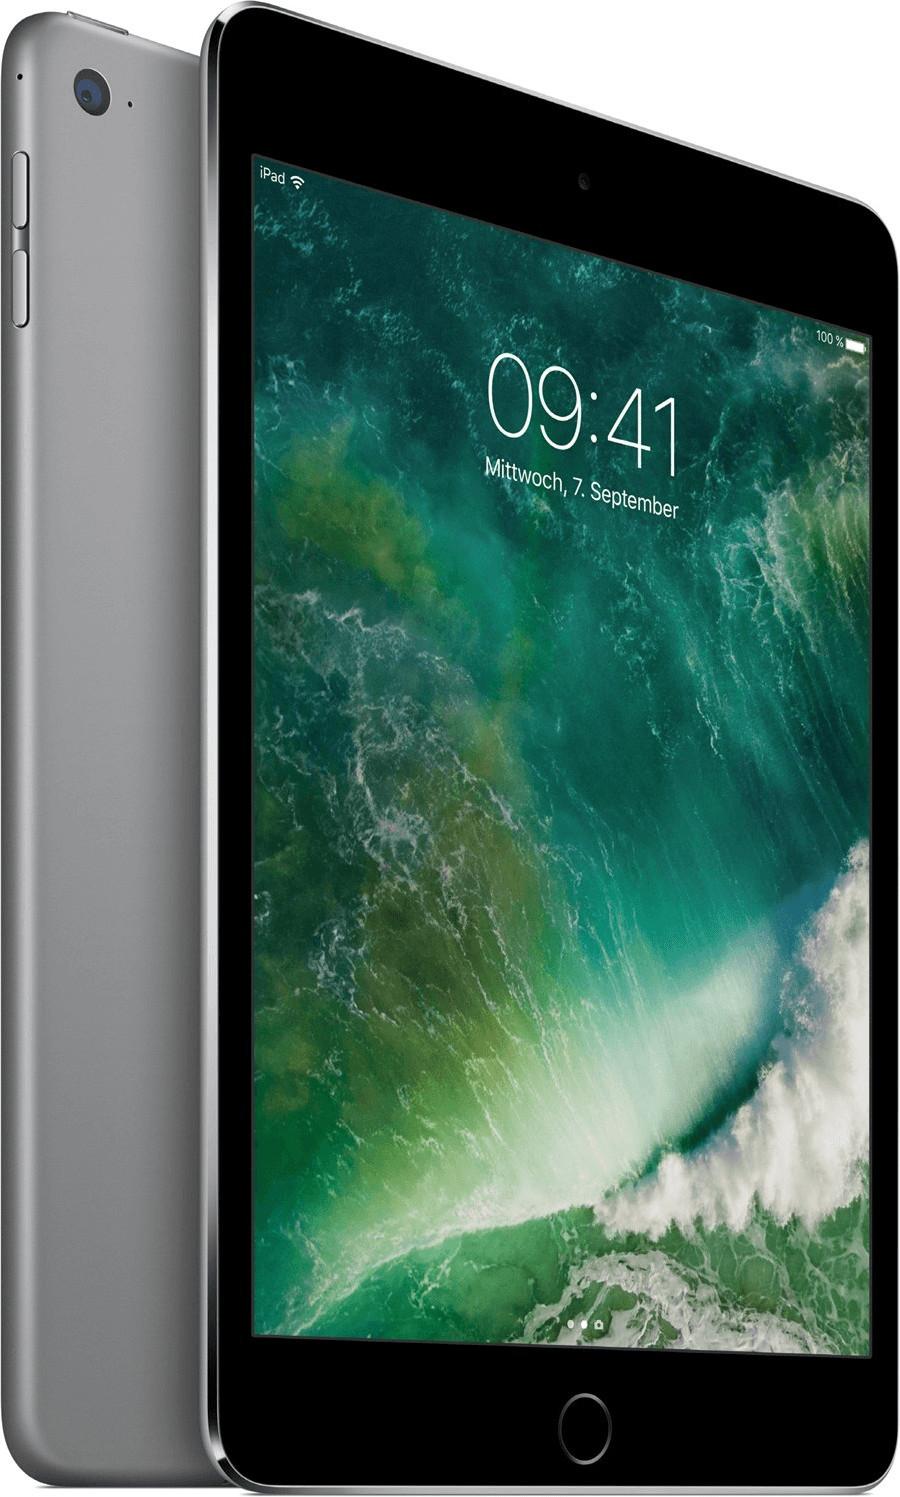 "[gebraucht] Apple iPad mini 4 Wi-Fi 128GB (2015) Space Gray (7.9"", 2048x1536, IPS, 2GB RAM, Lightning, iPadOS 14.4, 299g)"